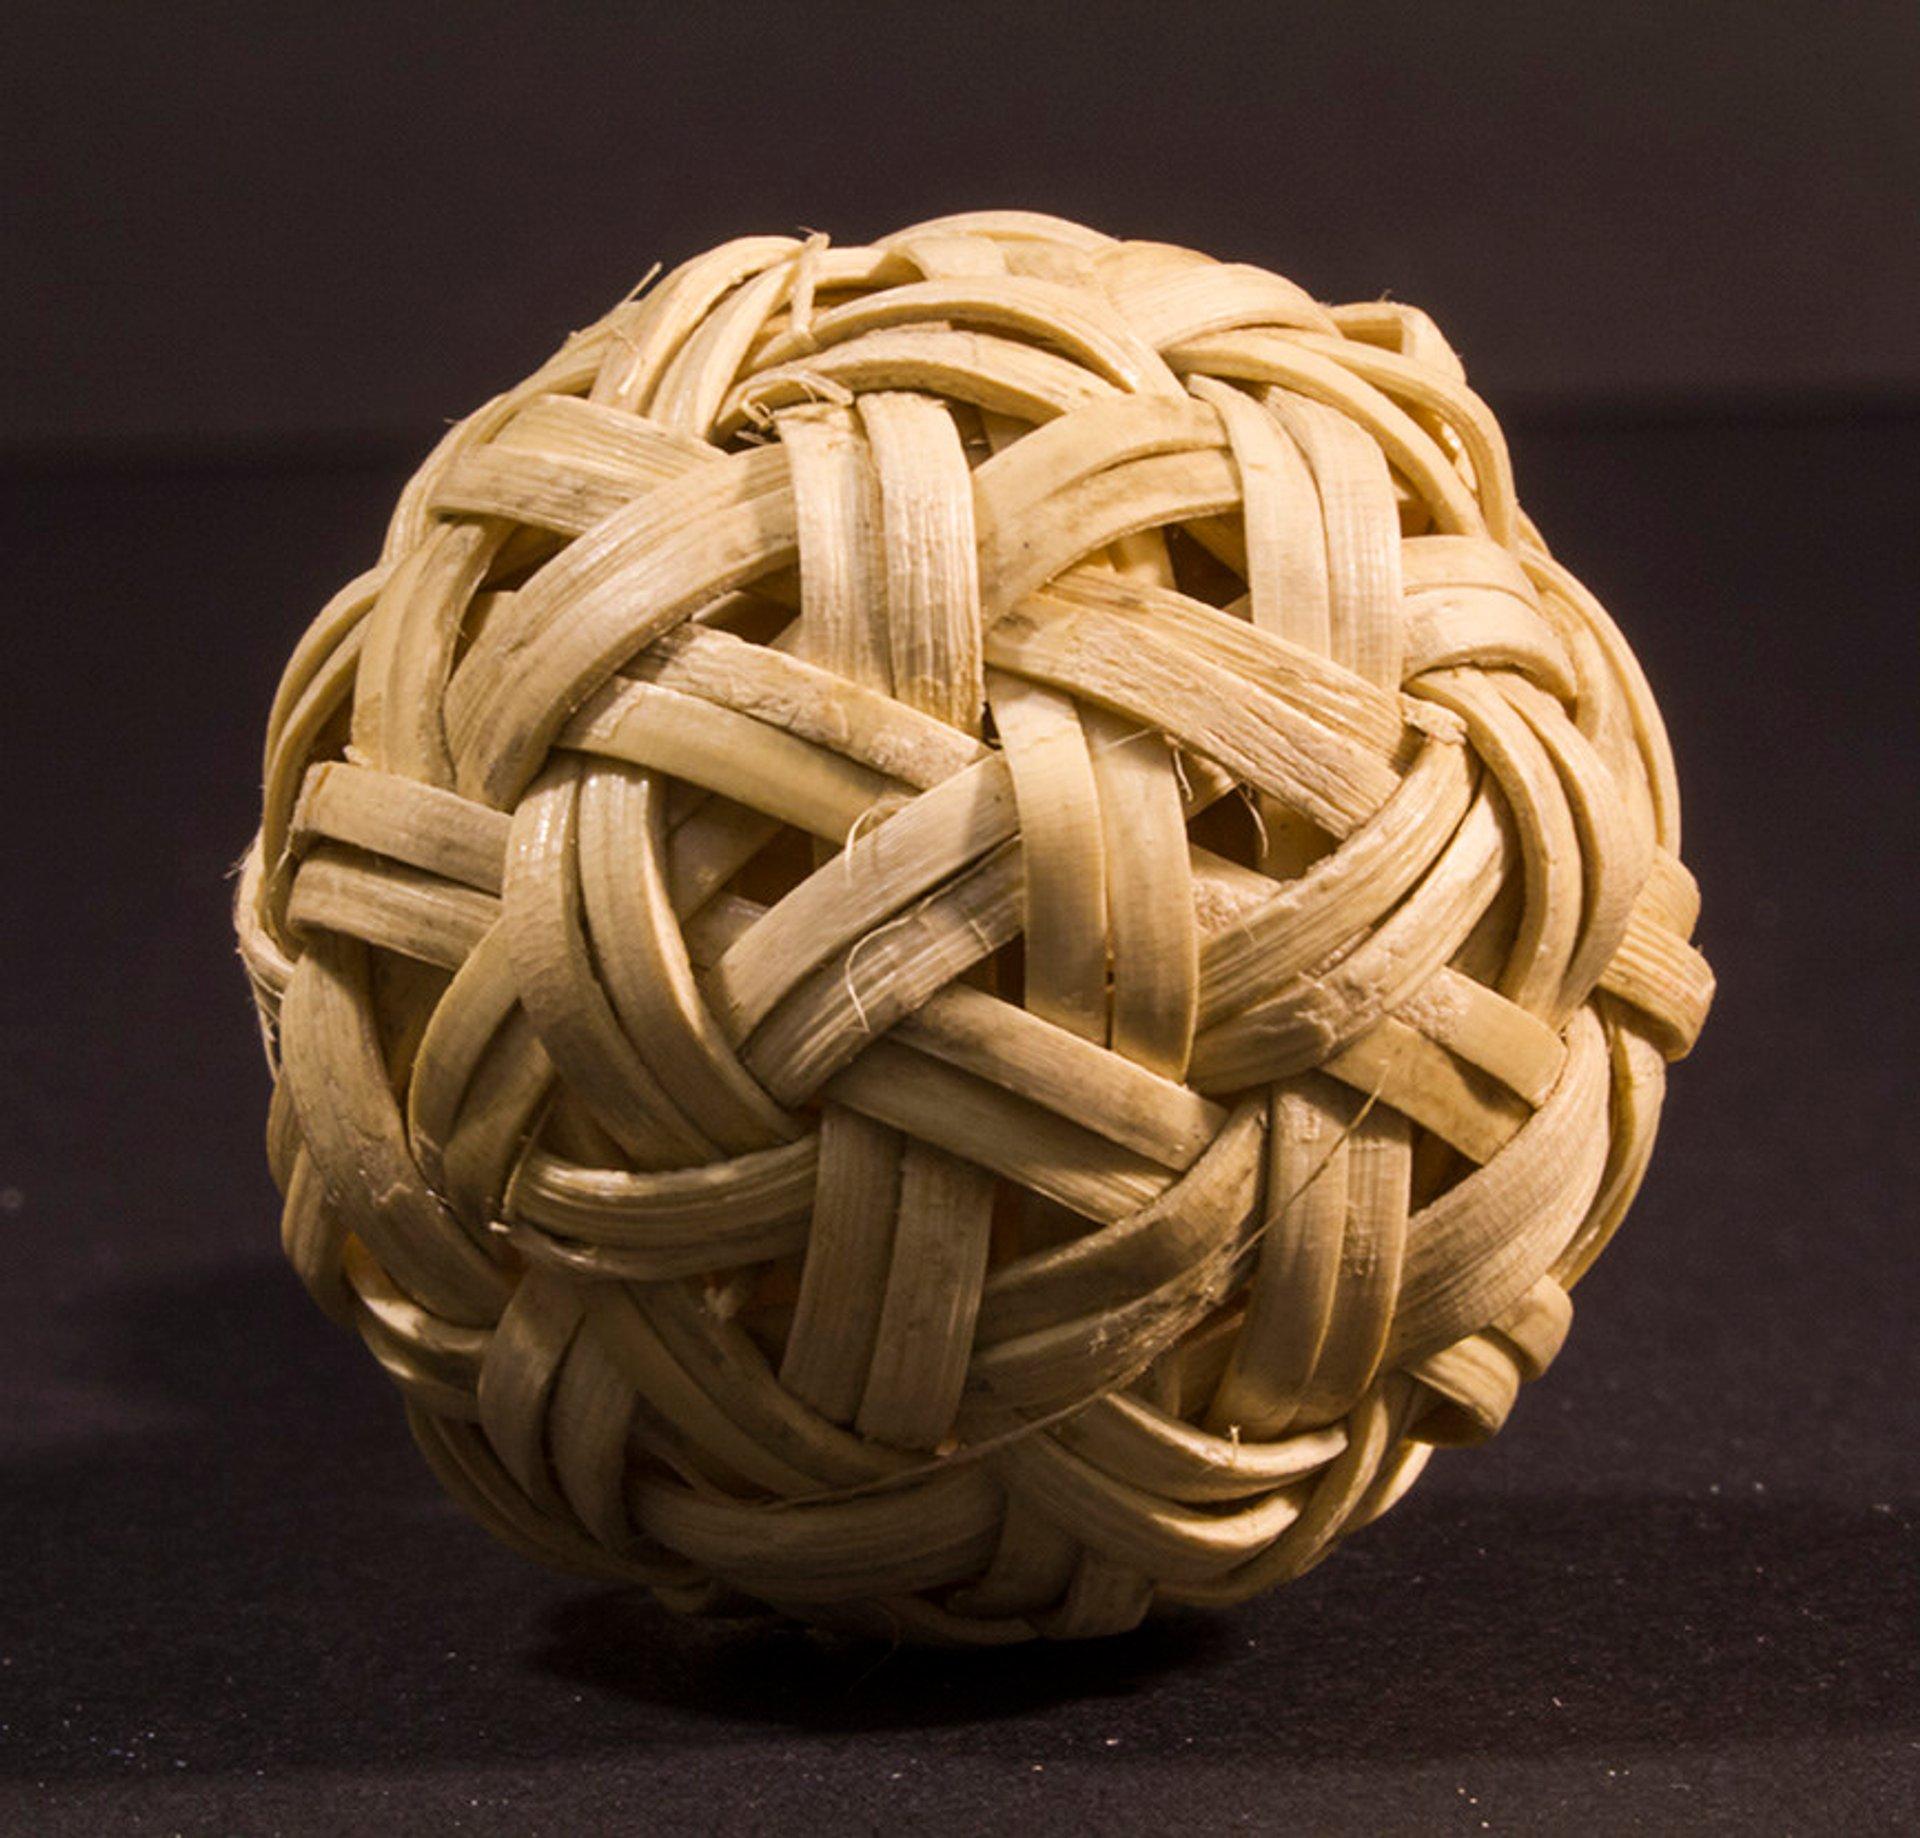 Miniature woven rattan ball bought at Scott Market, Yangon, 2.5 cm diameter